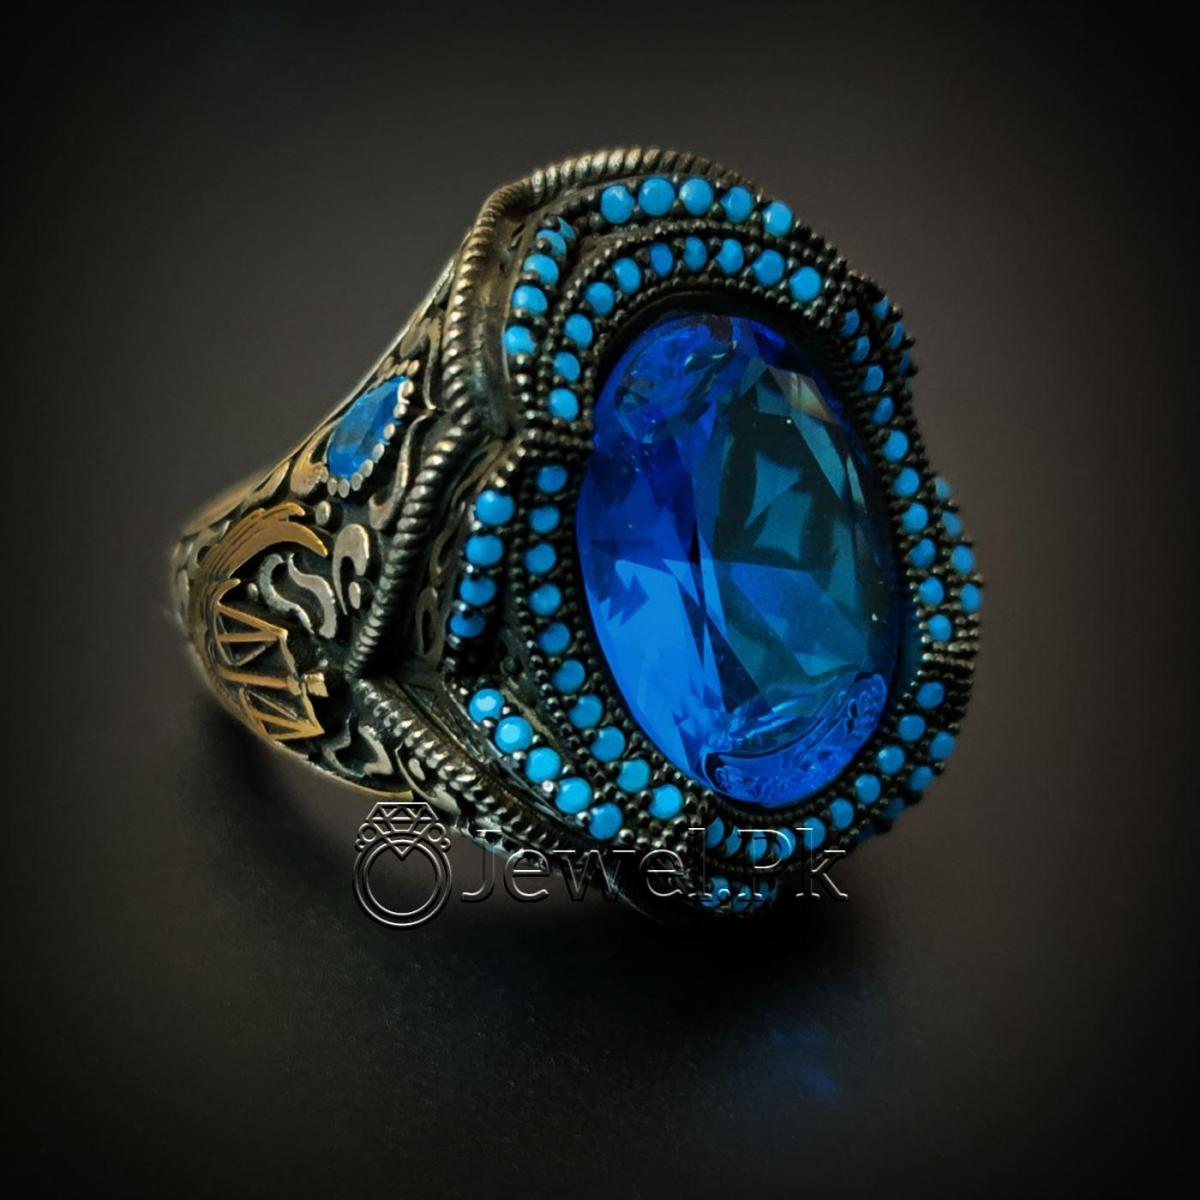 Turkish Ring 925 Silver Chandi Turkey Rings 2 natural gemstones pakistan + 925 silver jewelry online